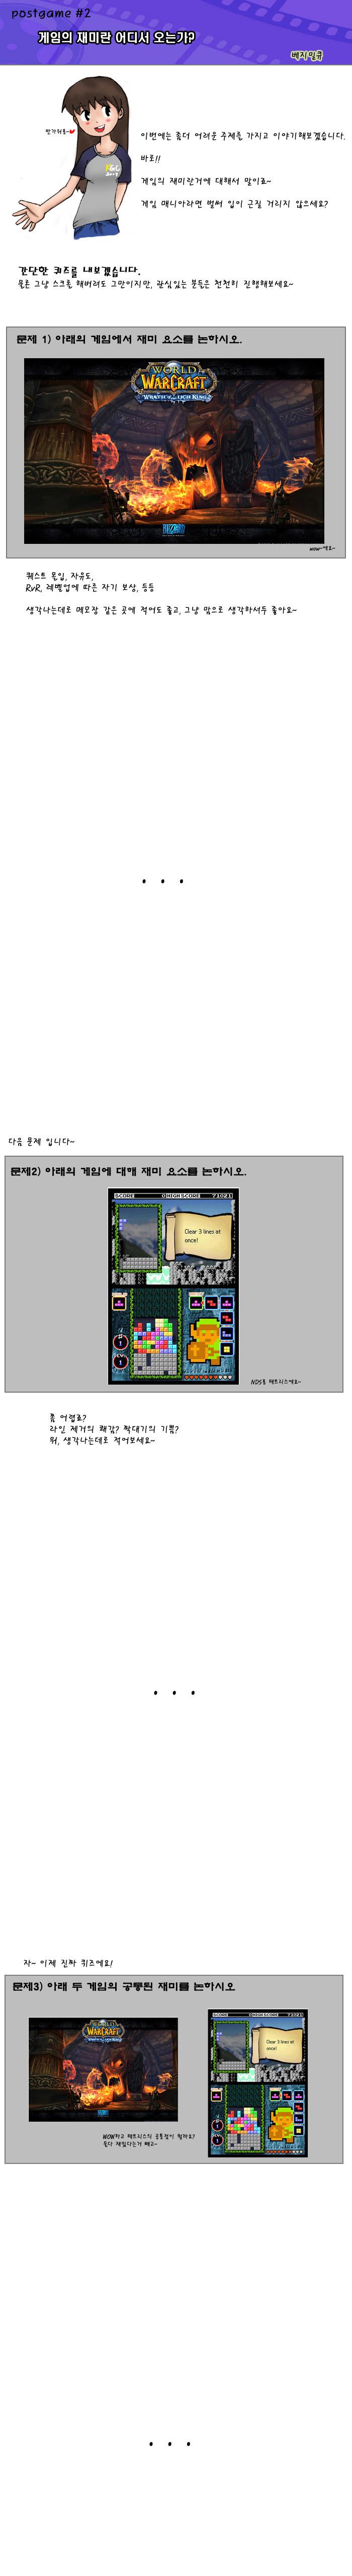 postgame-게임의 재미는 어디서 오는가? | Daum 루리웹